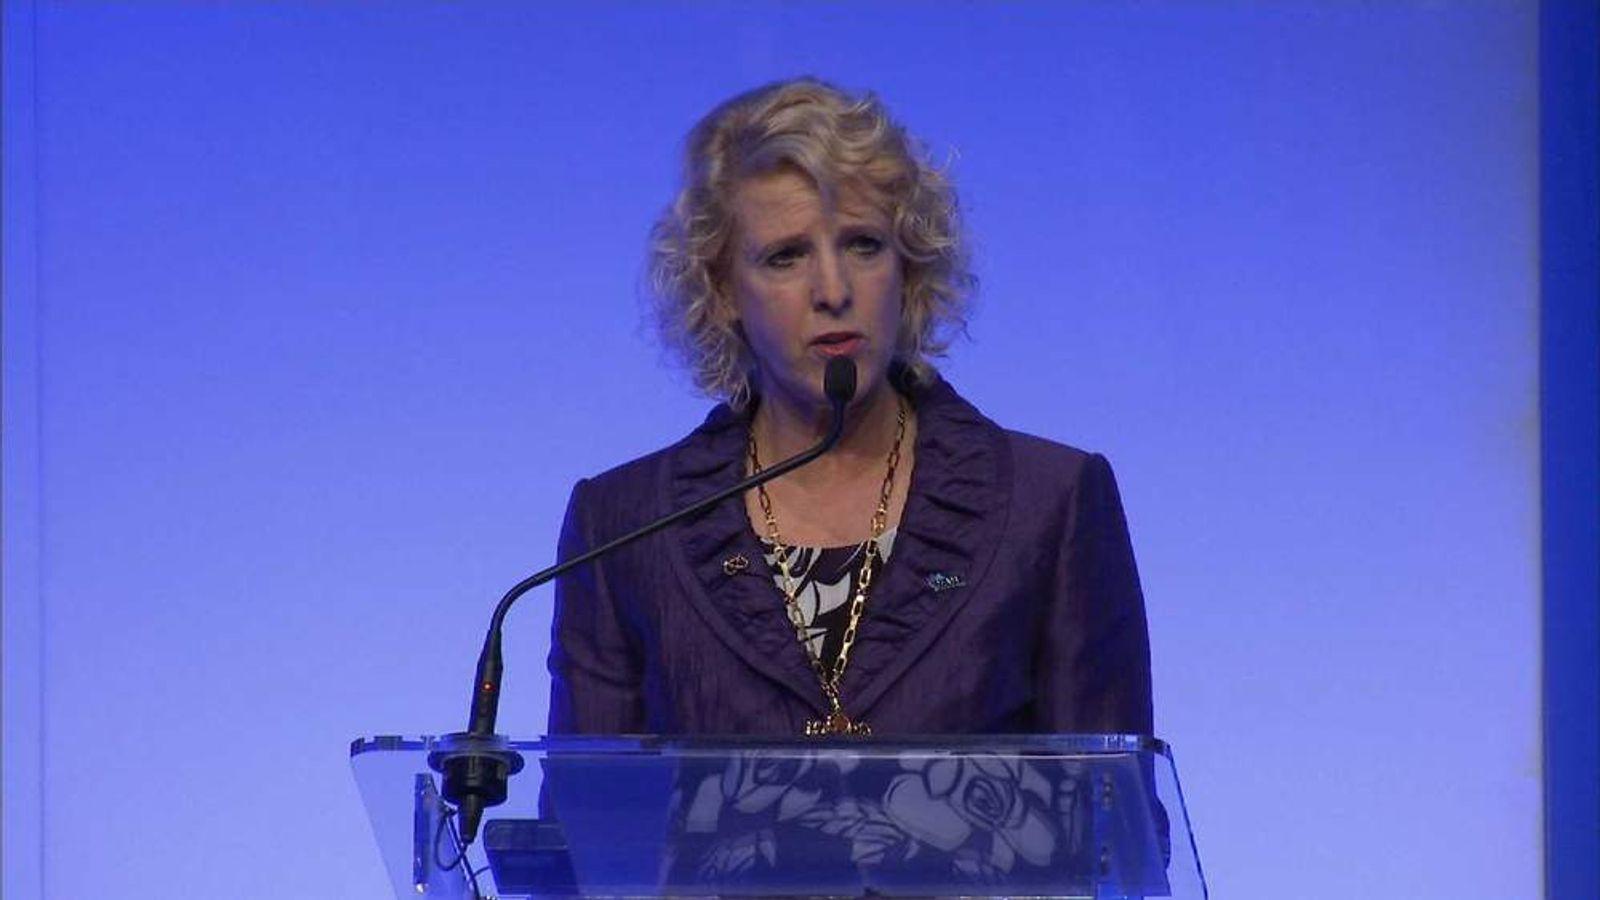 Bernadette Hunter speaking on government education reforms